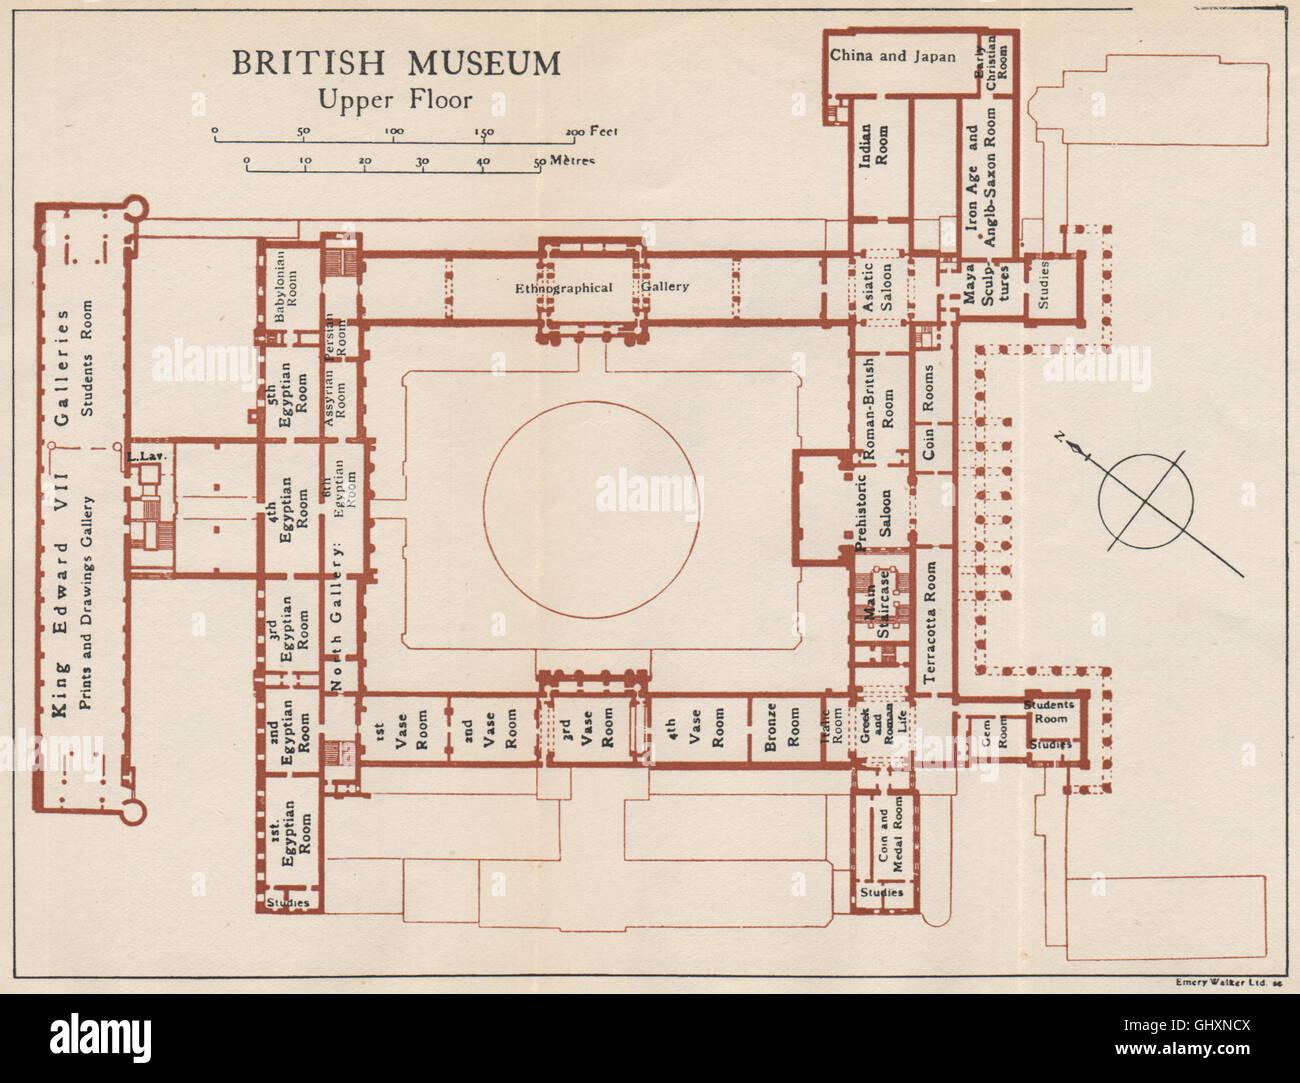 British Museum Upper Floor Vintage Map Plan London 1935 Stock